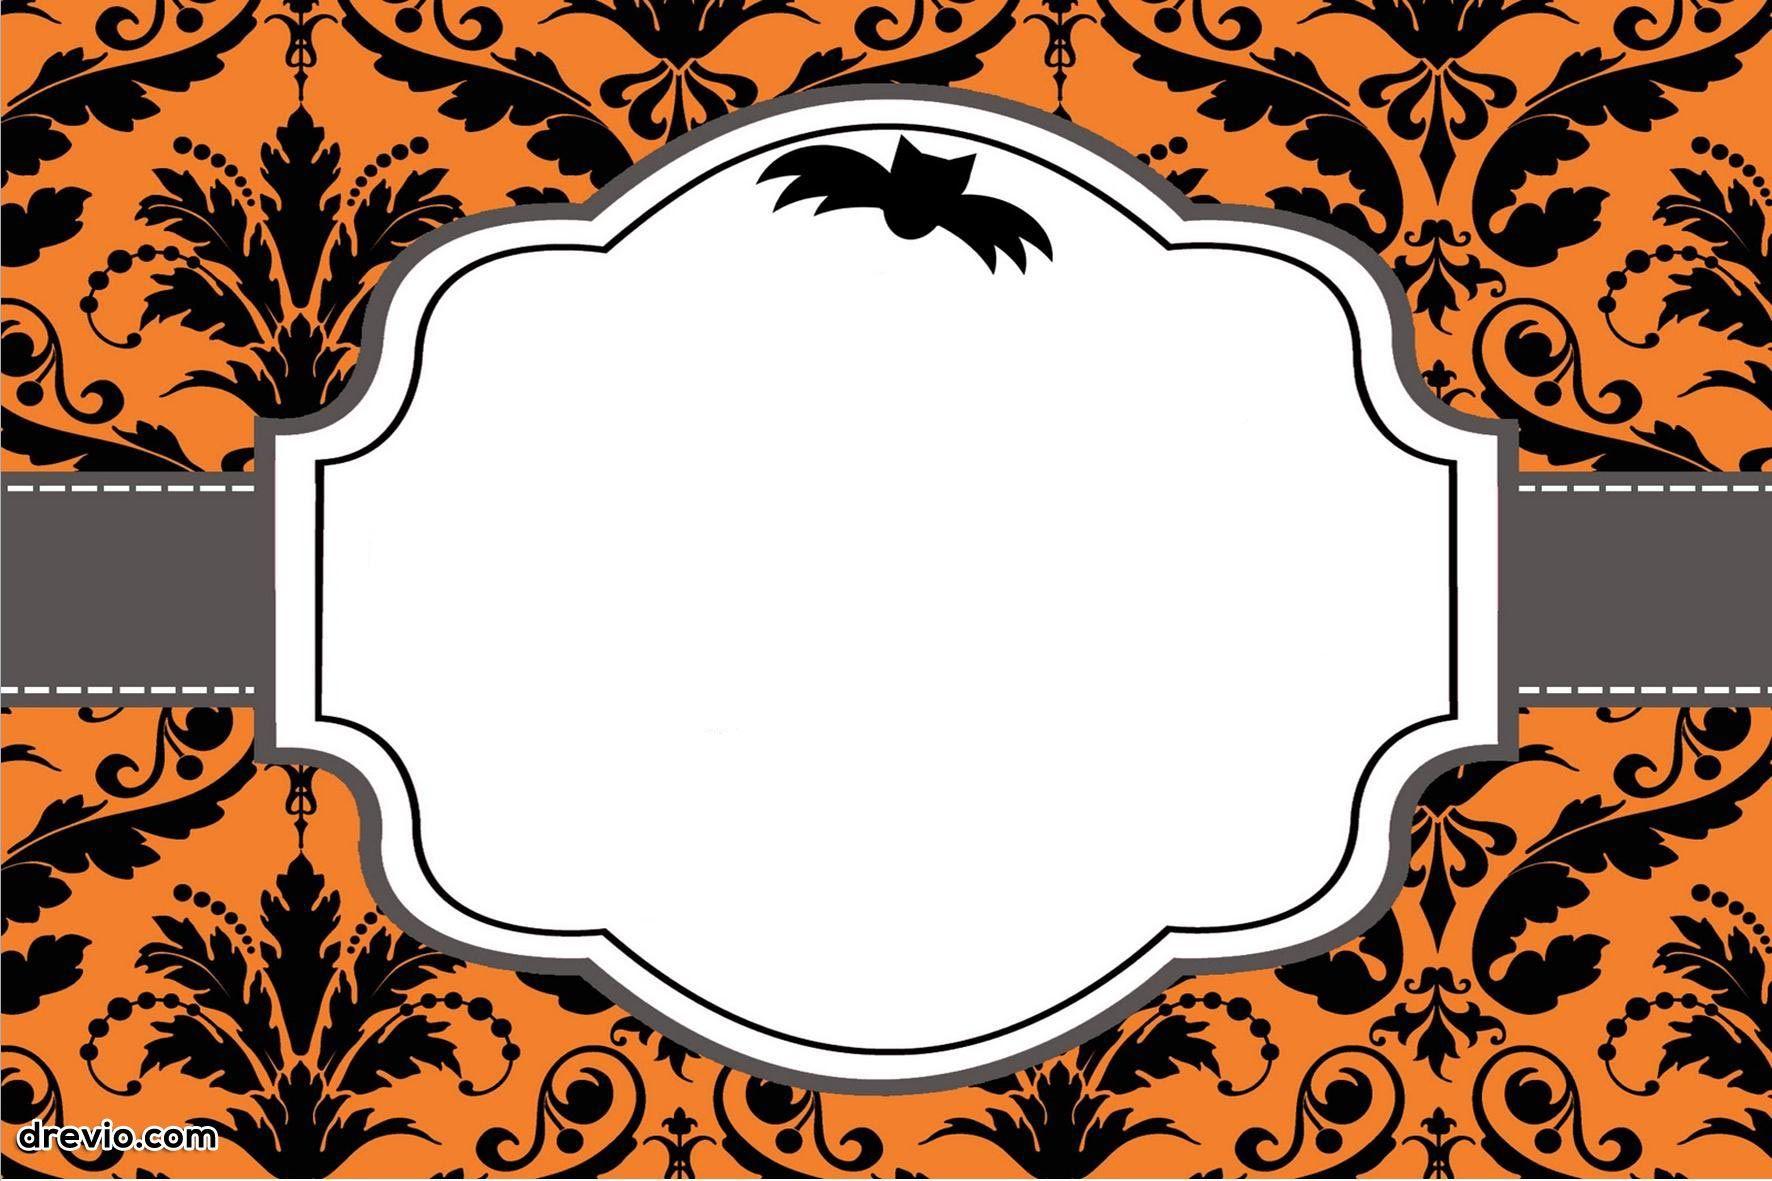 Free Printable Halloween Invitations | Free Printable Birthday - Halloween Party Invitation Templates Free Printable